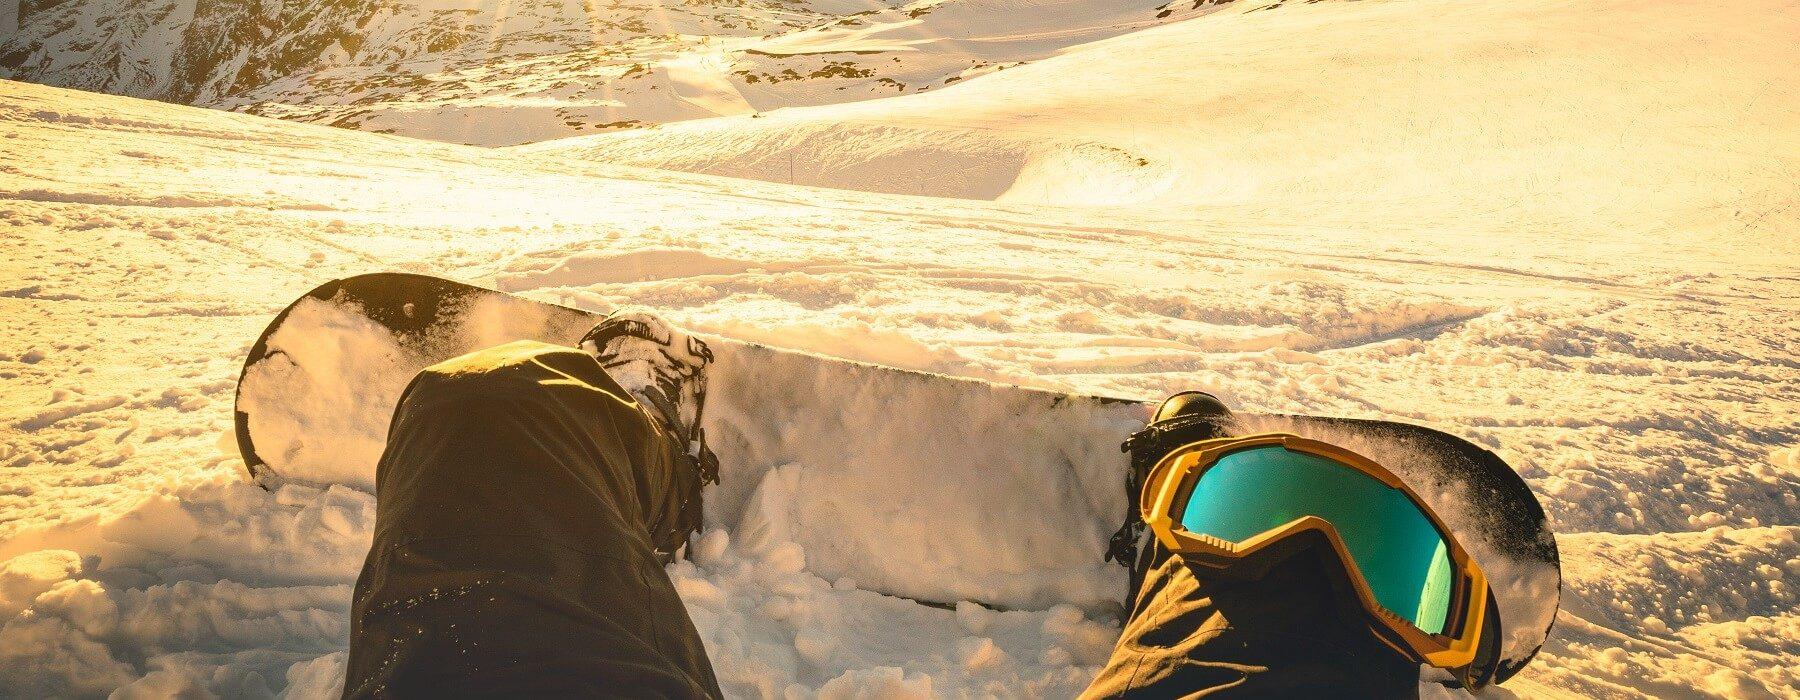 Snowboarding in Big Sky, Montana.